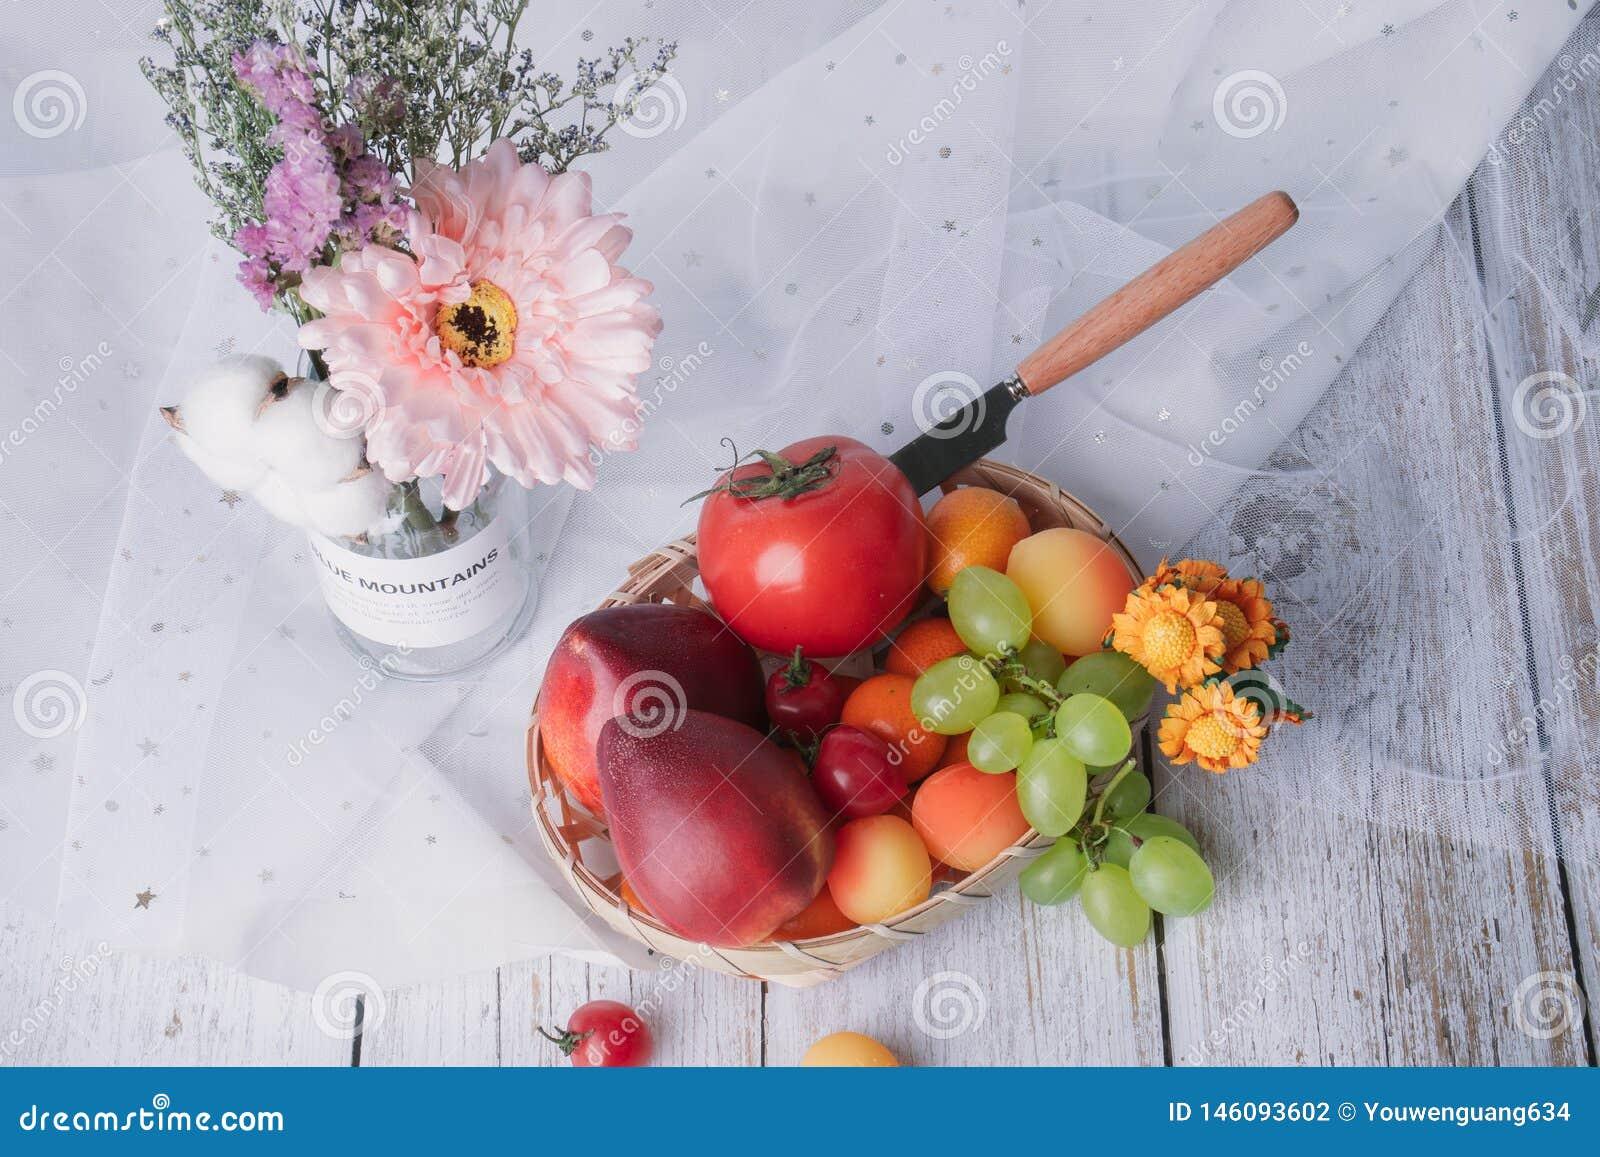 Цветок со свежими фруктами